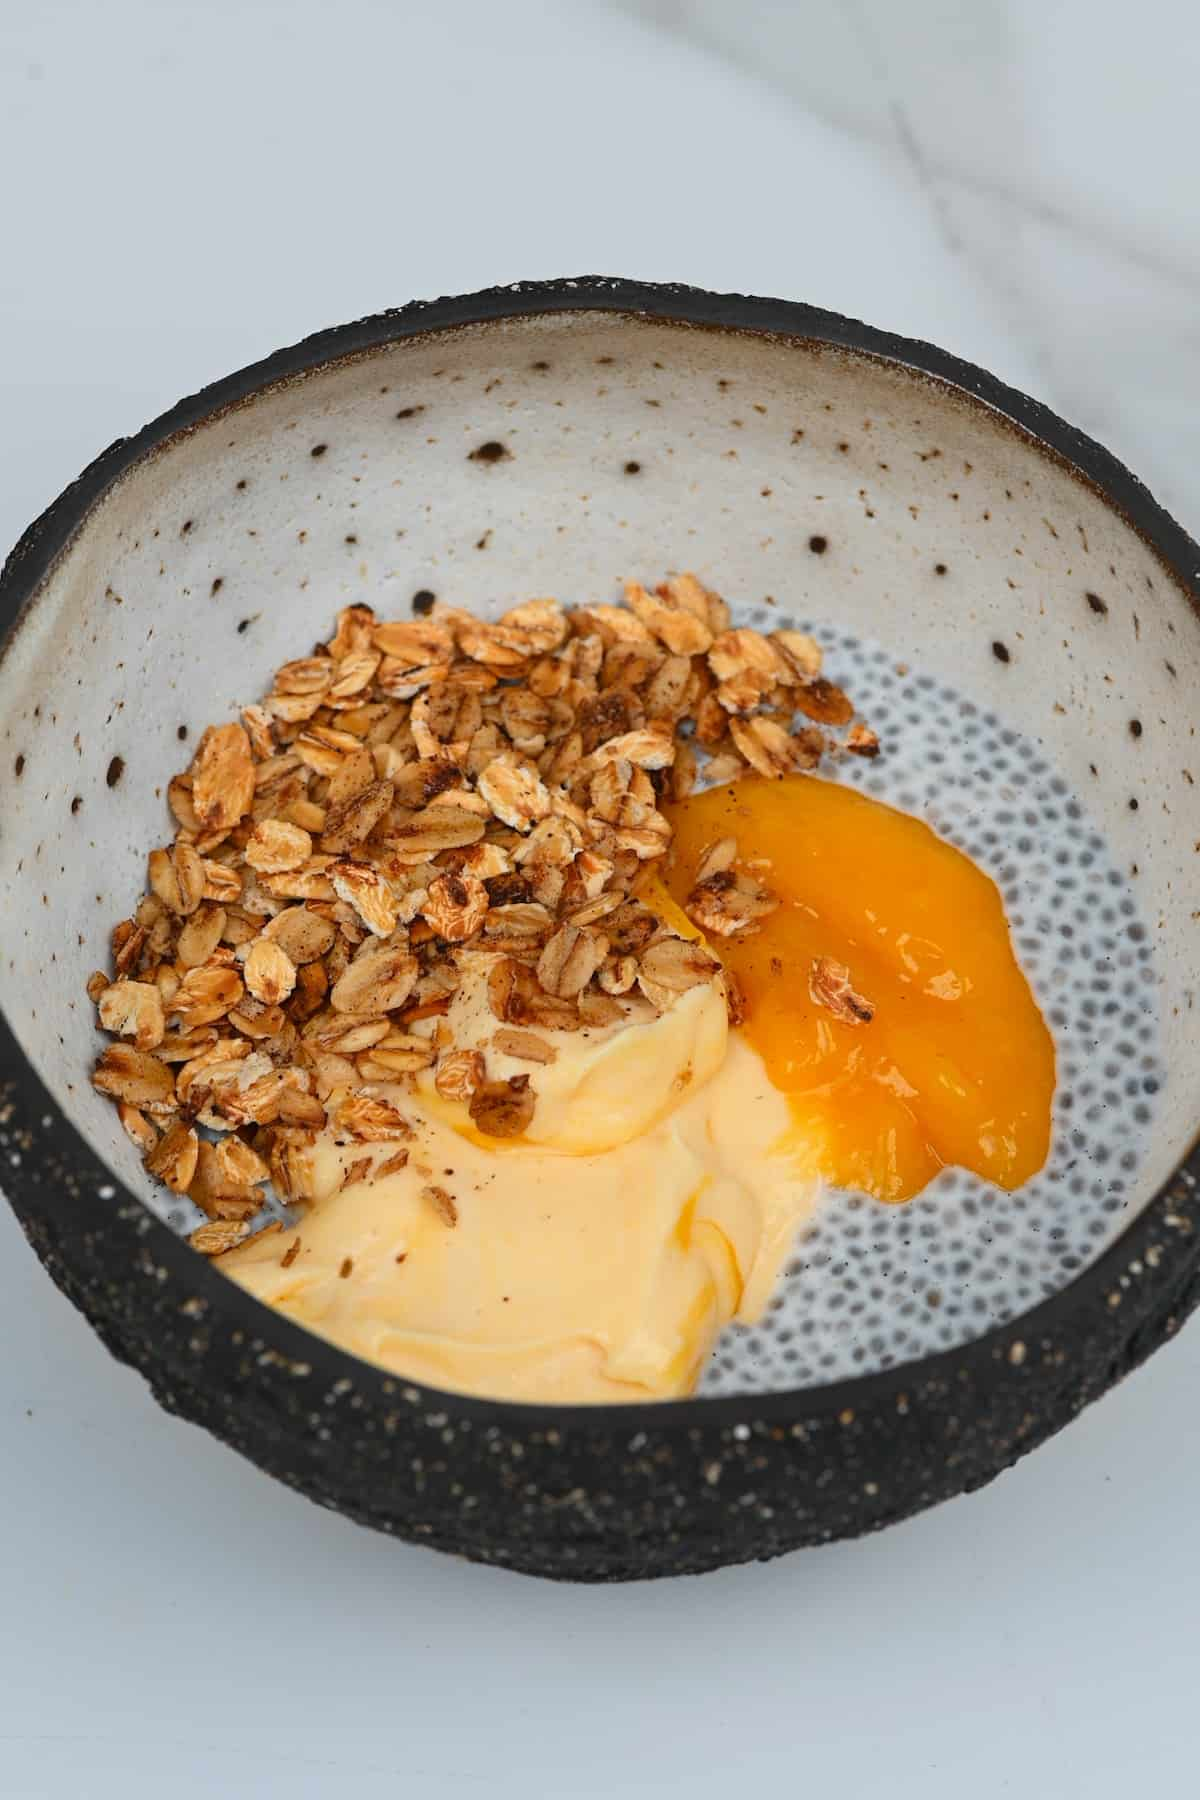 Chia pudding and mango yogurt topped with crispy oats